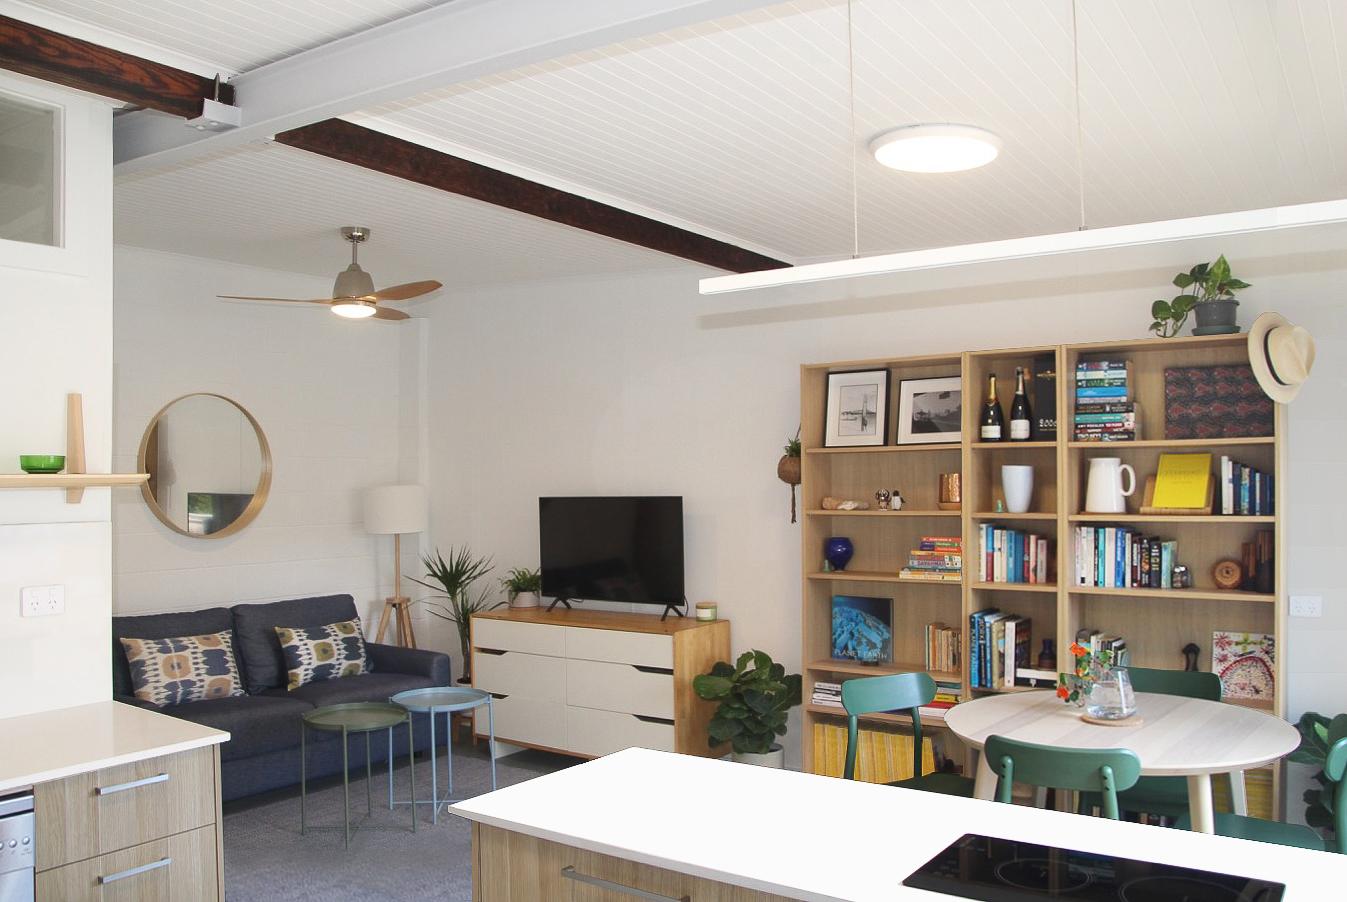 Malabar beachside studio kitchen and living areas